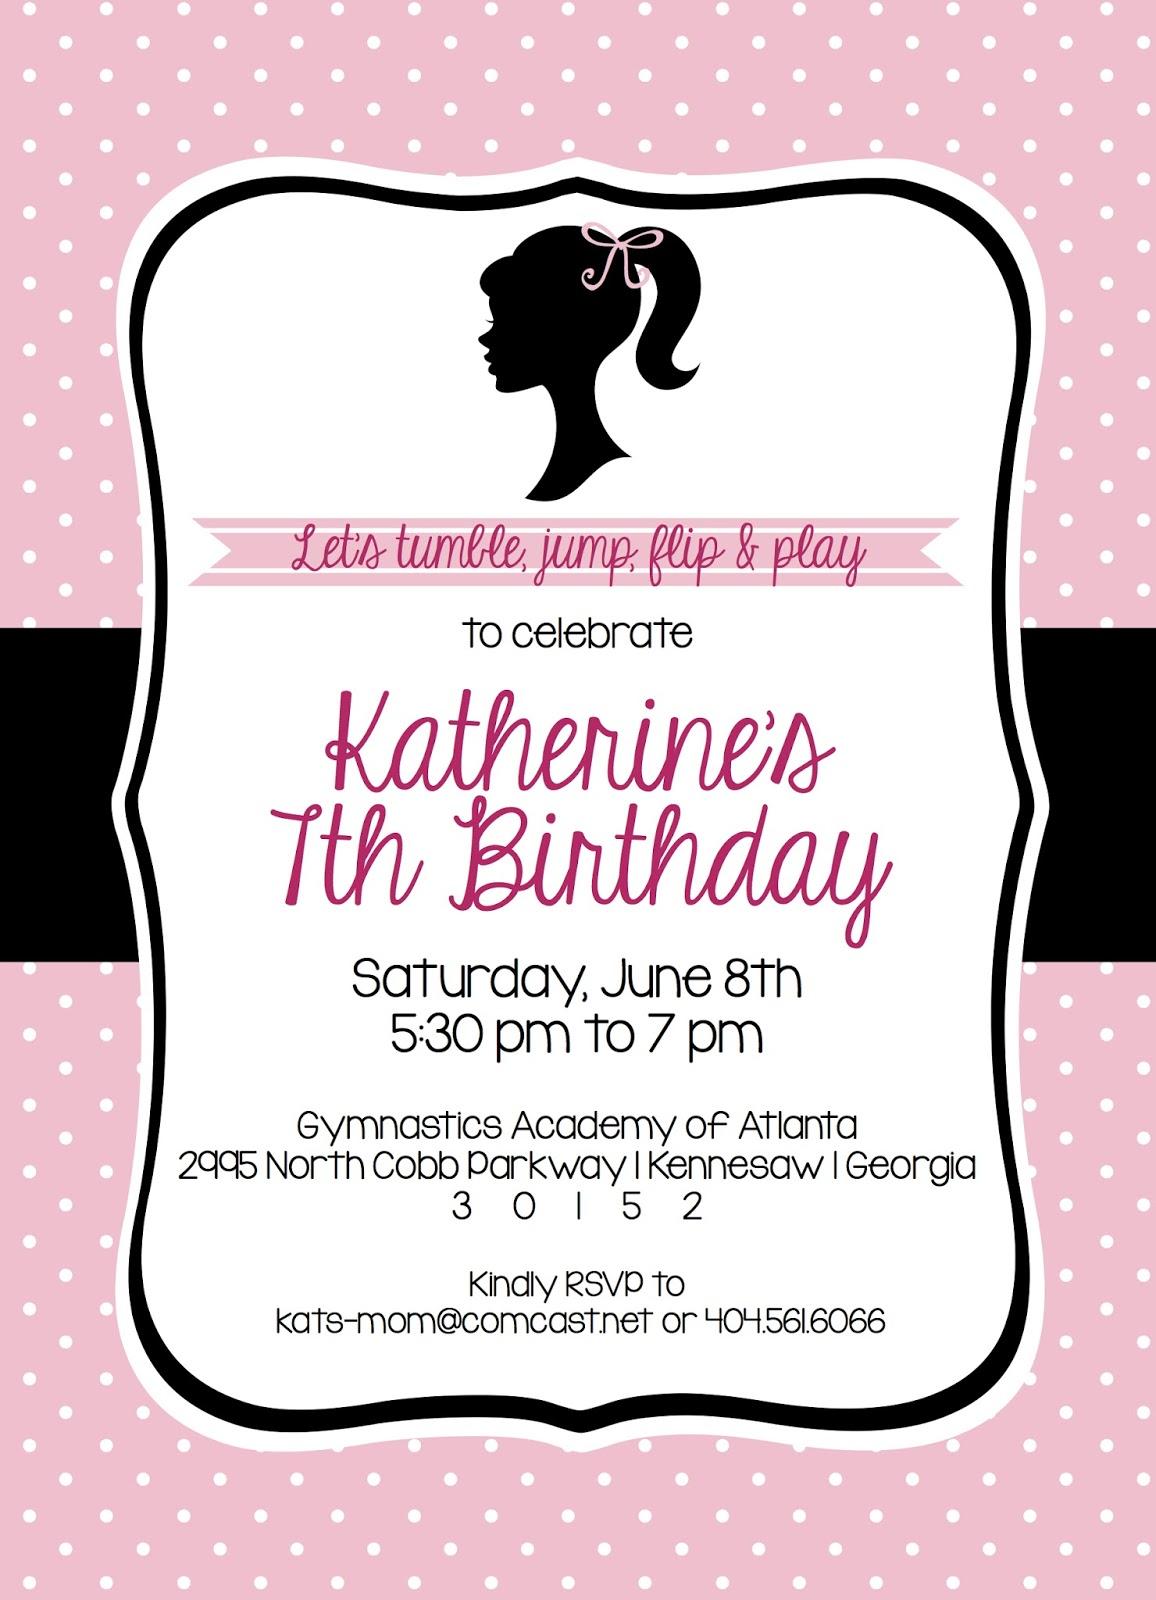 Shilo Lynn Prints: katherine: barbie birthday invitation